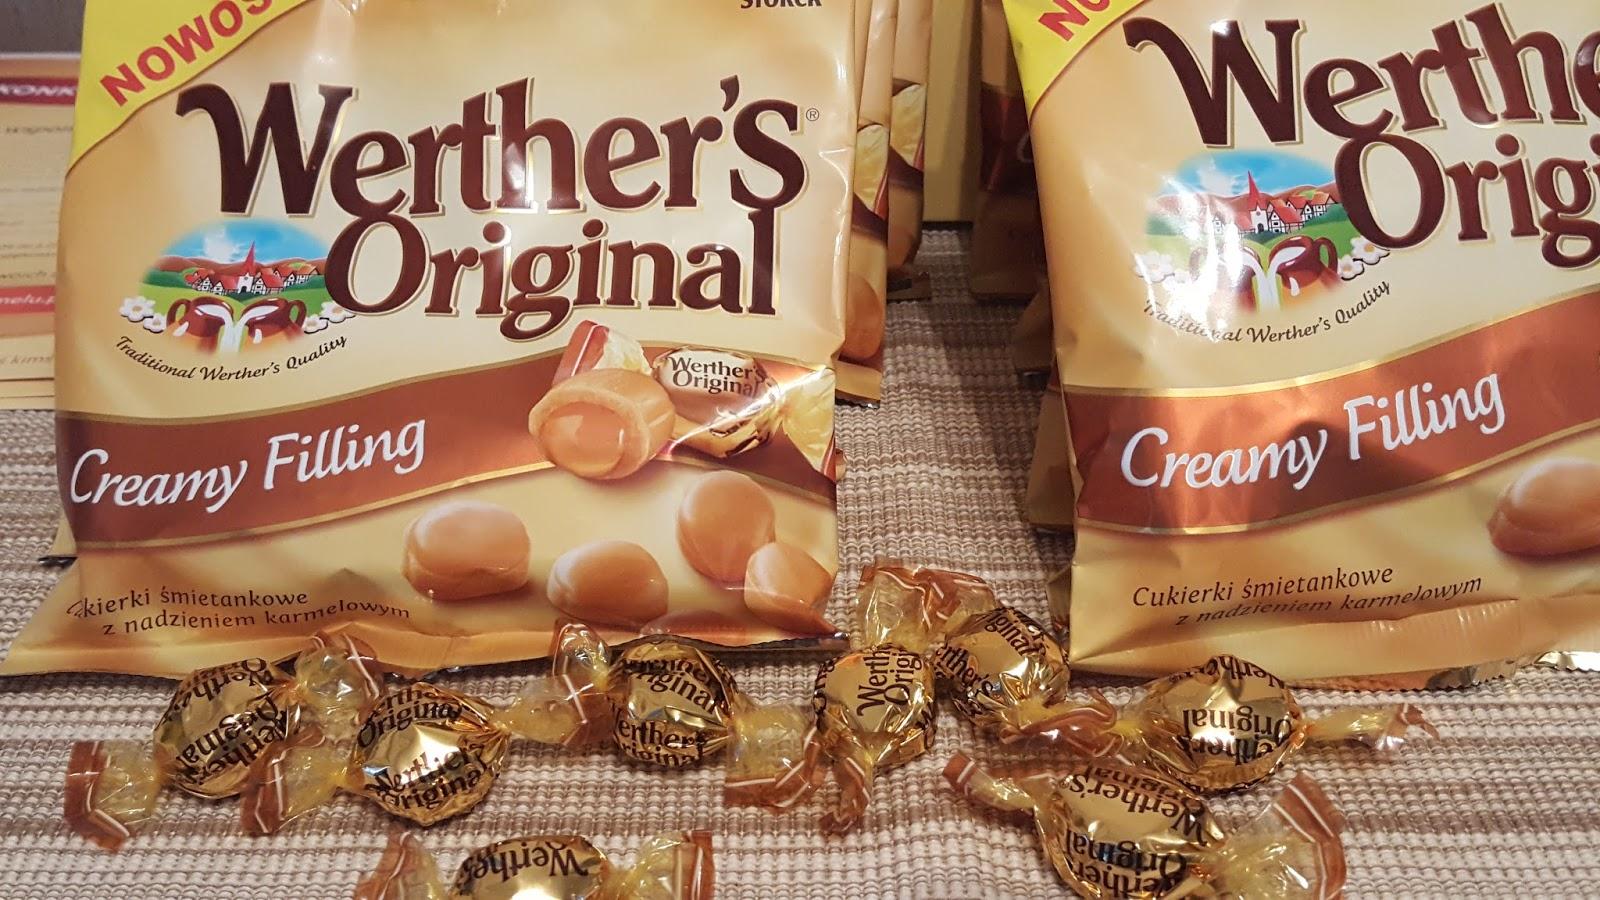 Werther's Original / Creamy Filling / Recenzja